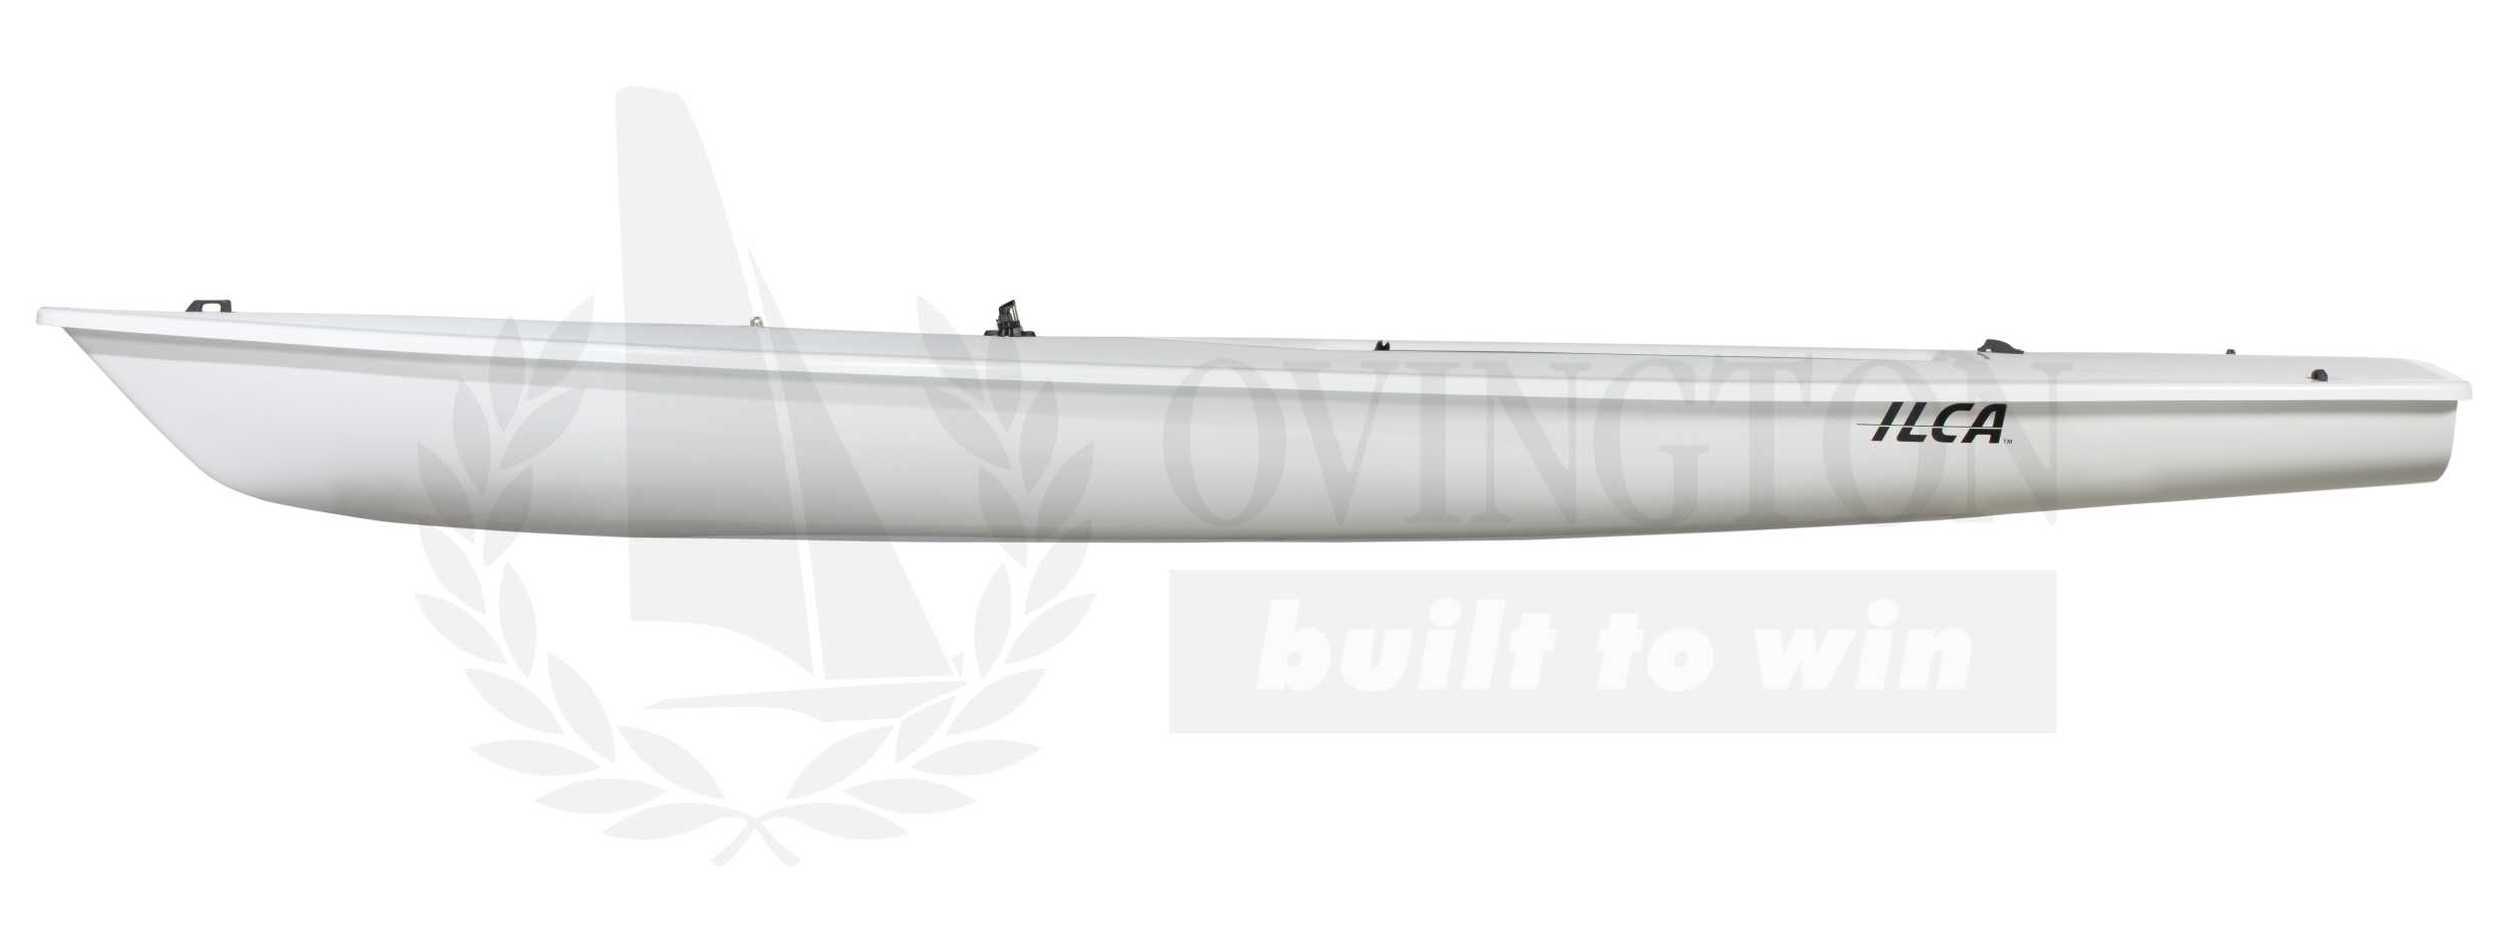 ovington-ilca-hull-white-1-2500-950a.jpg